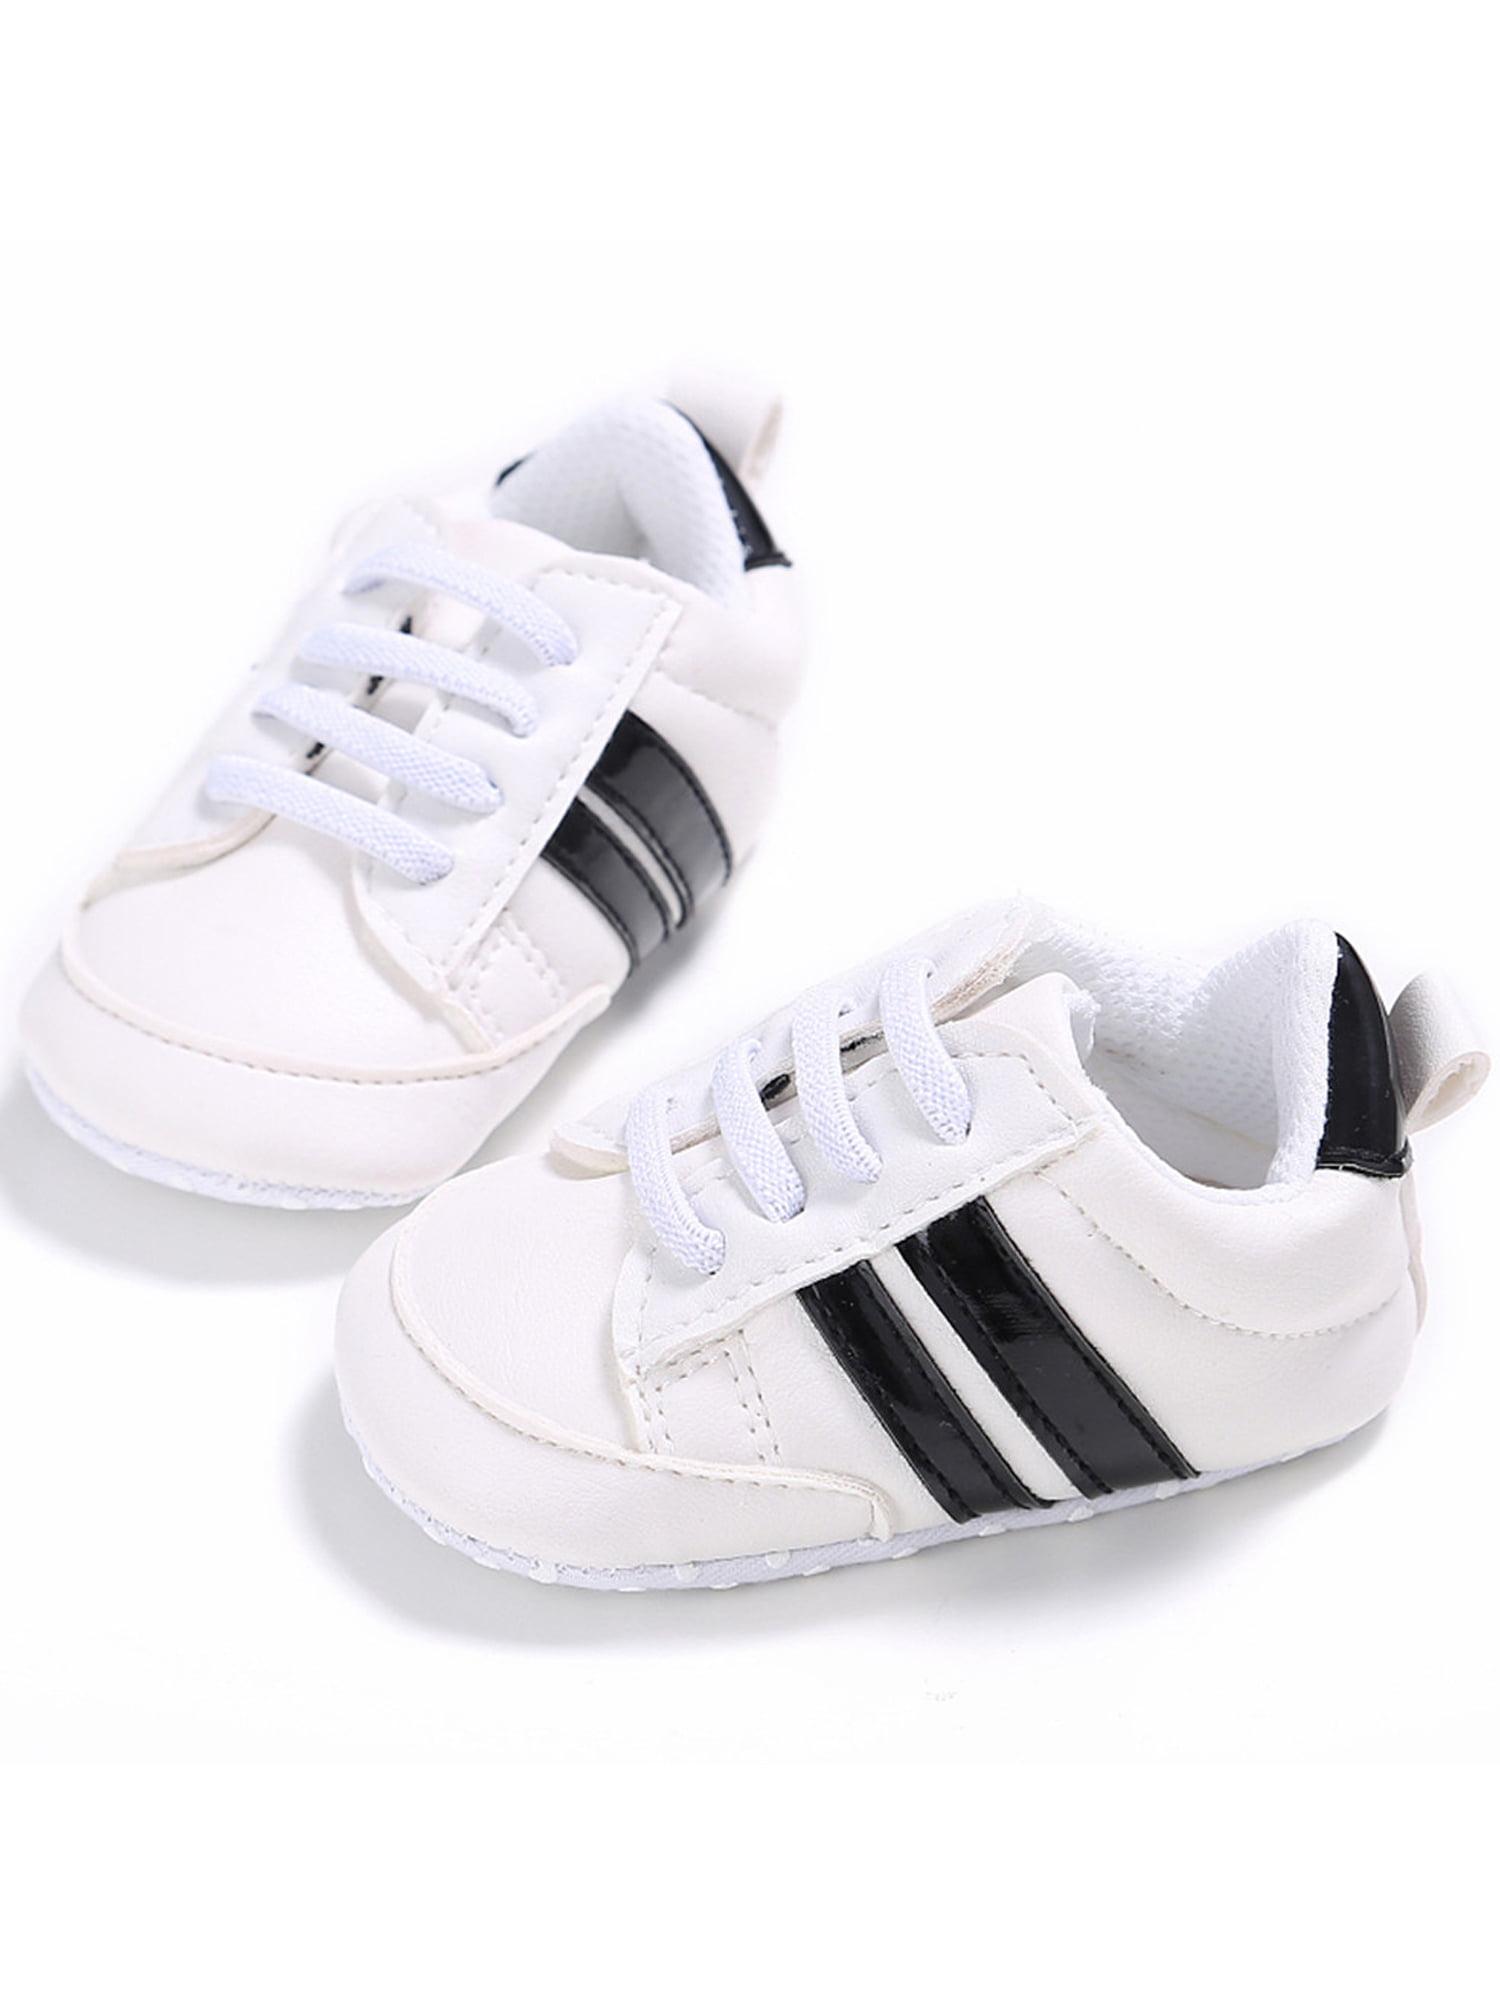 mlpeerw Adorable Sneakers Newborn Baby